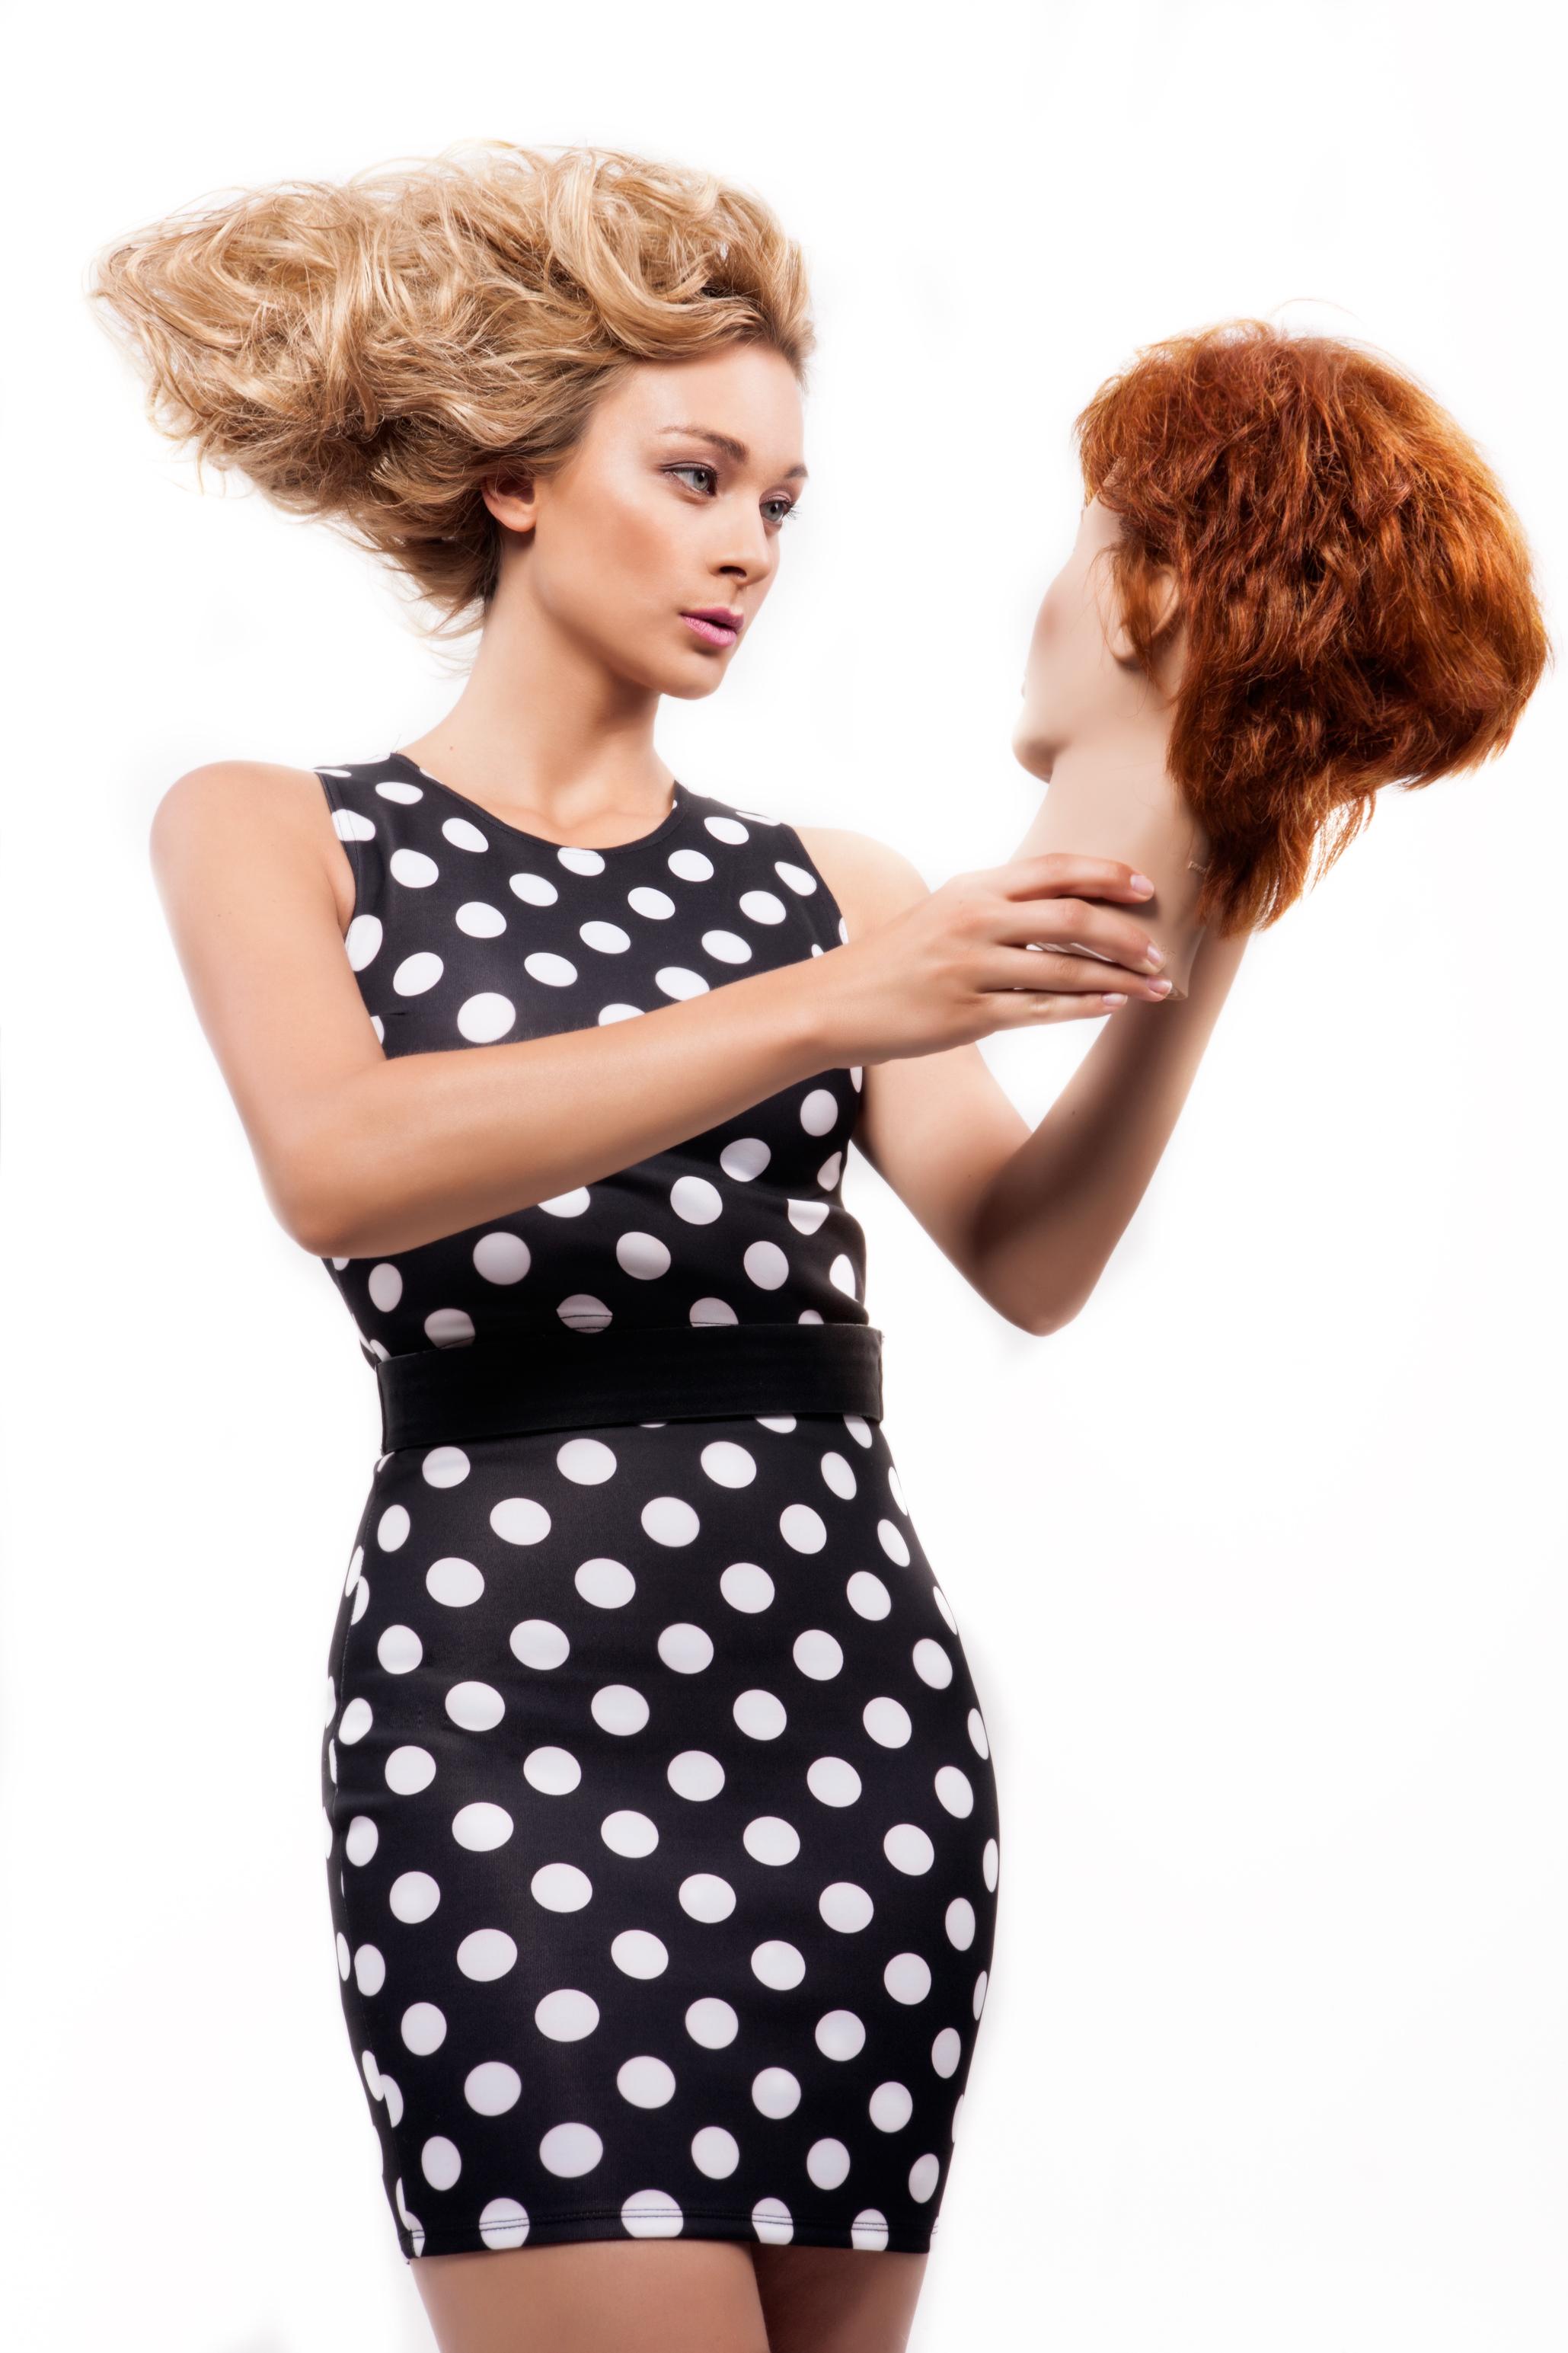 Hair Studio Honza Kořínek